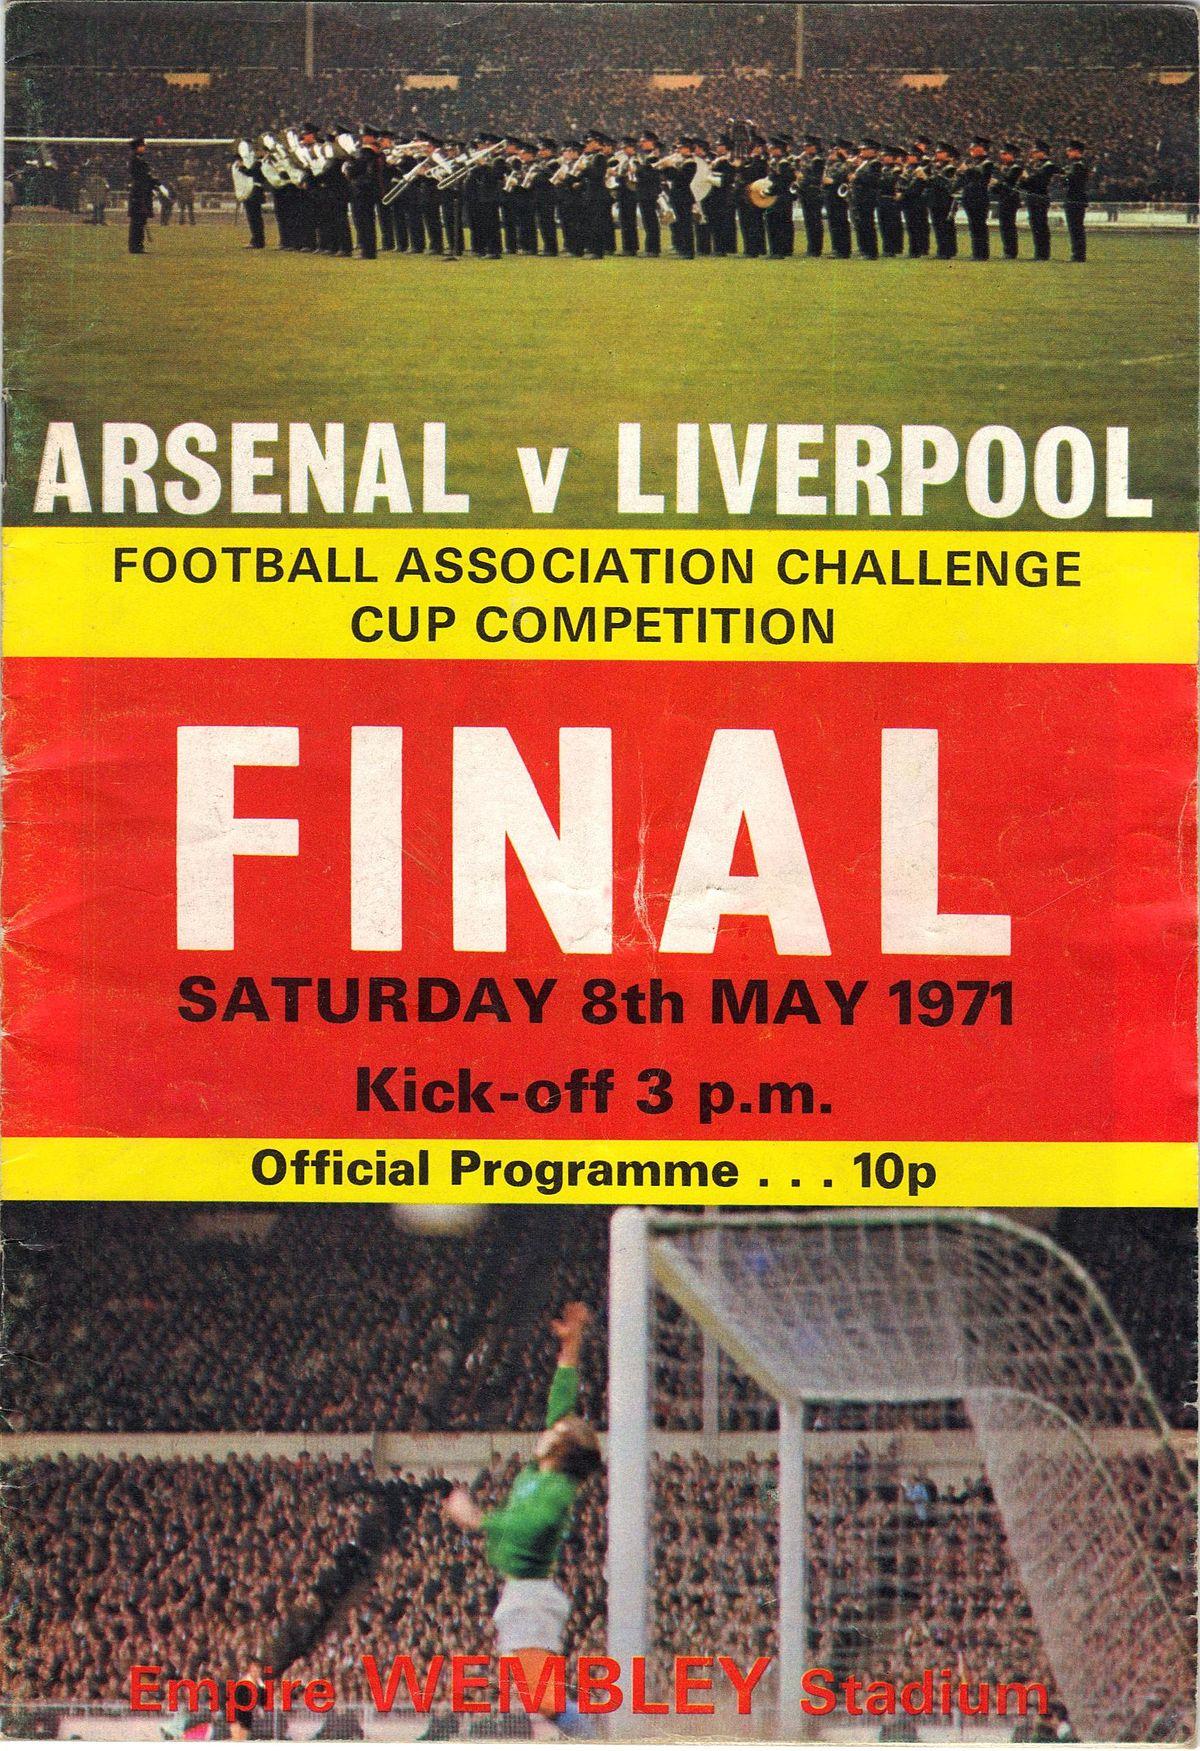 Финал Кубка Англии по футболу 1971 — Википедия